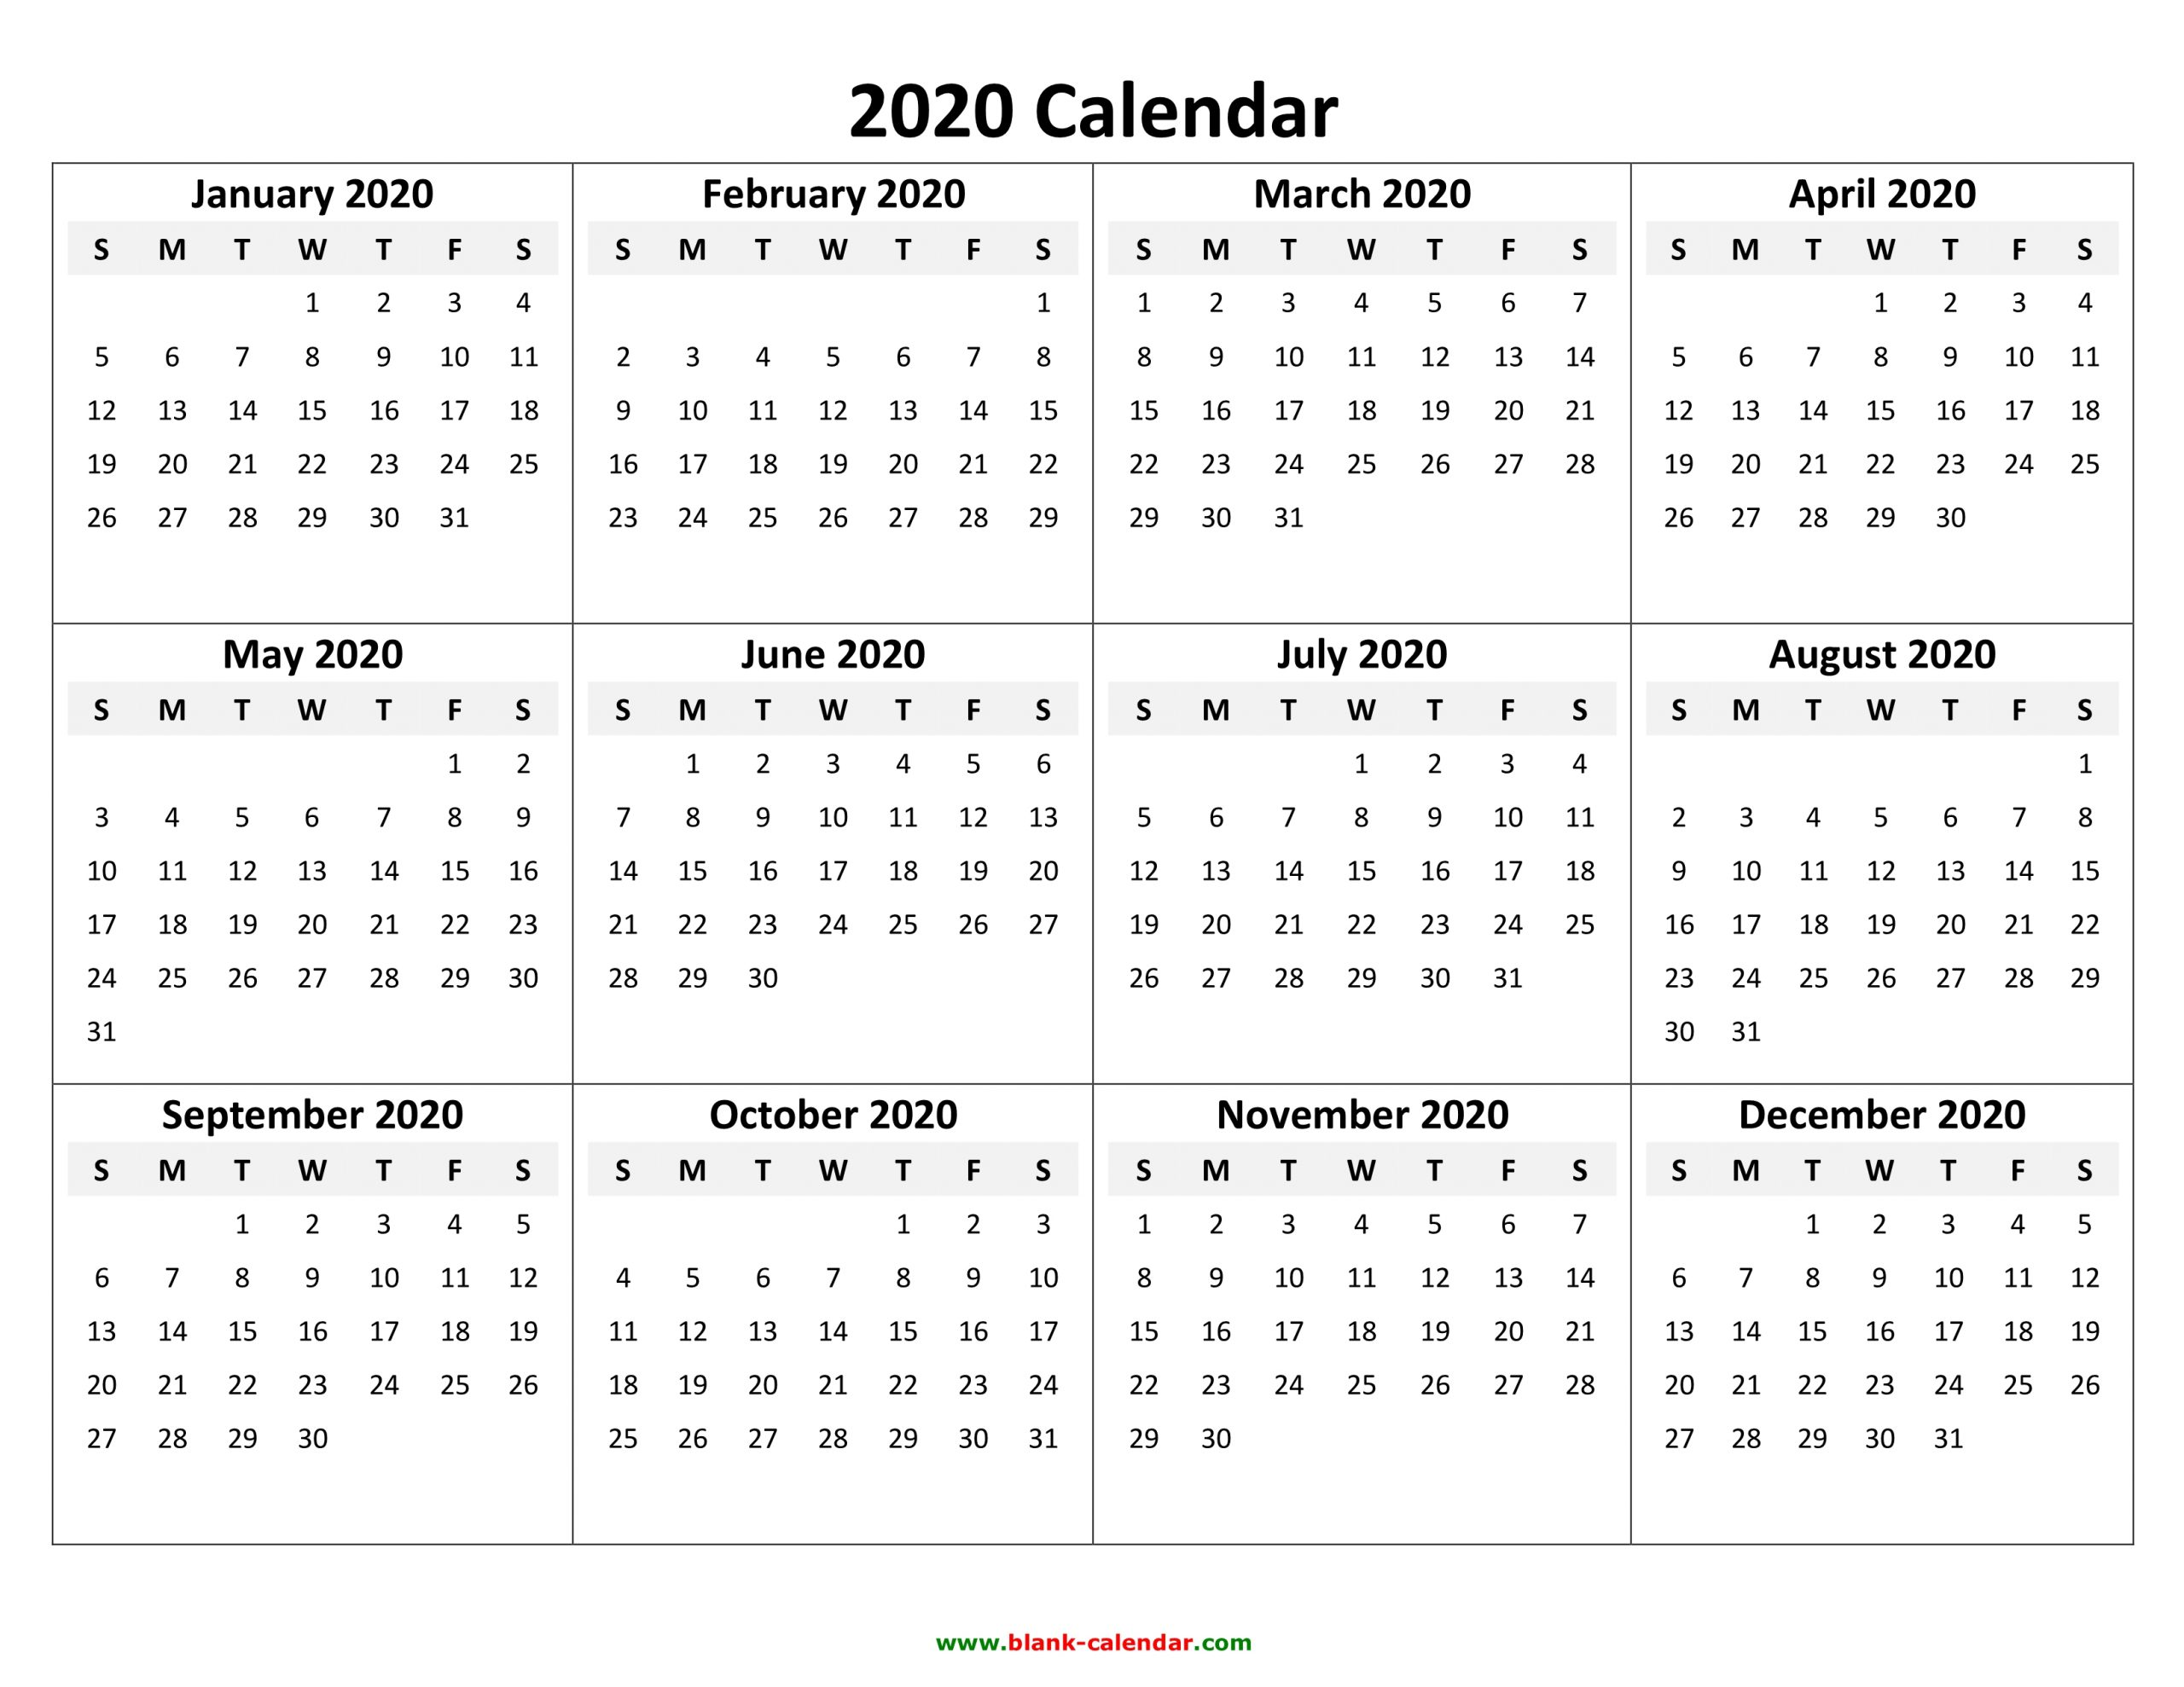 Free 2020 Printable Calendar Templates Create Your Own